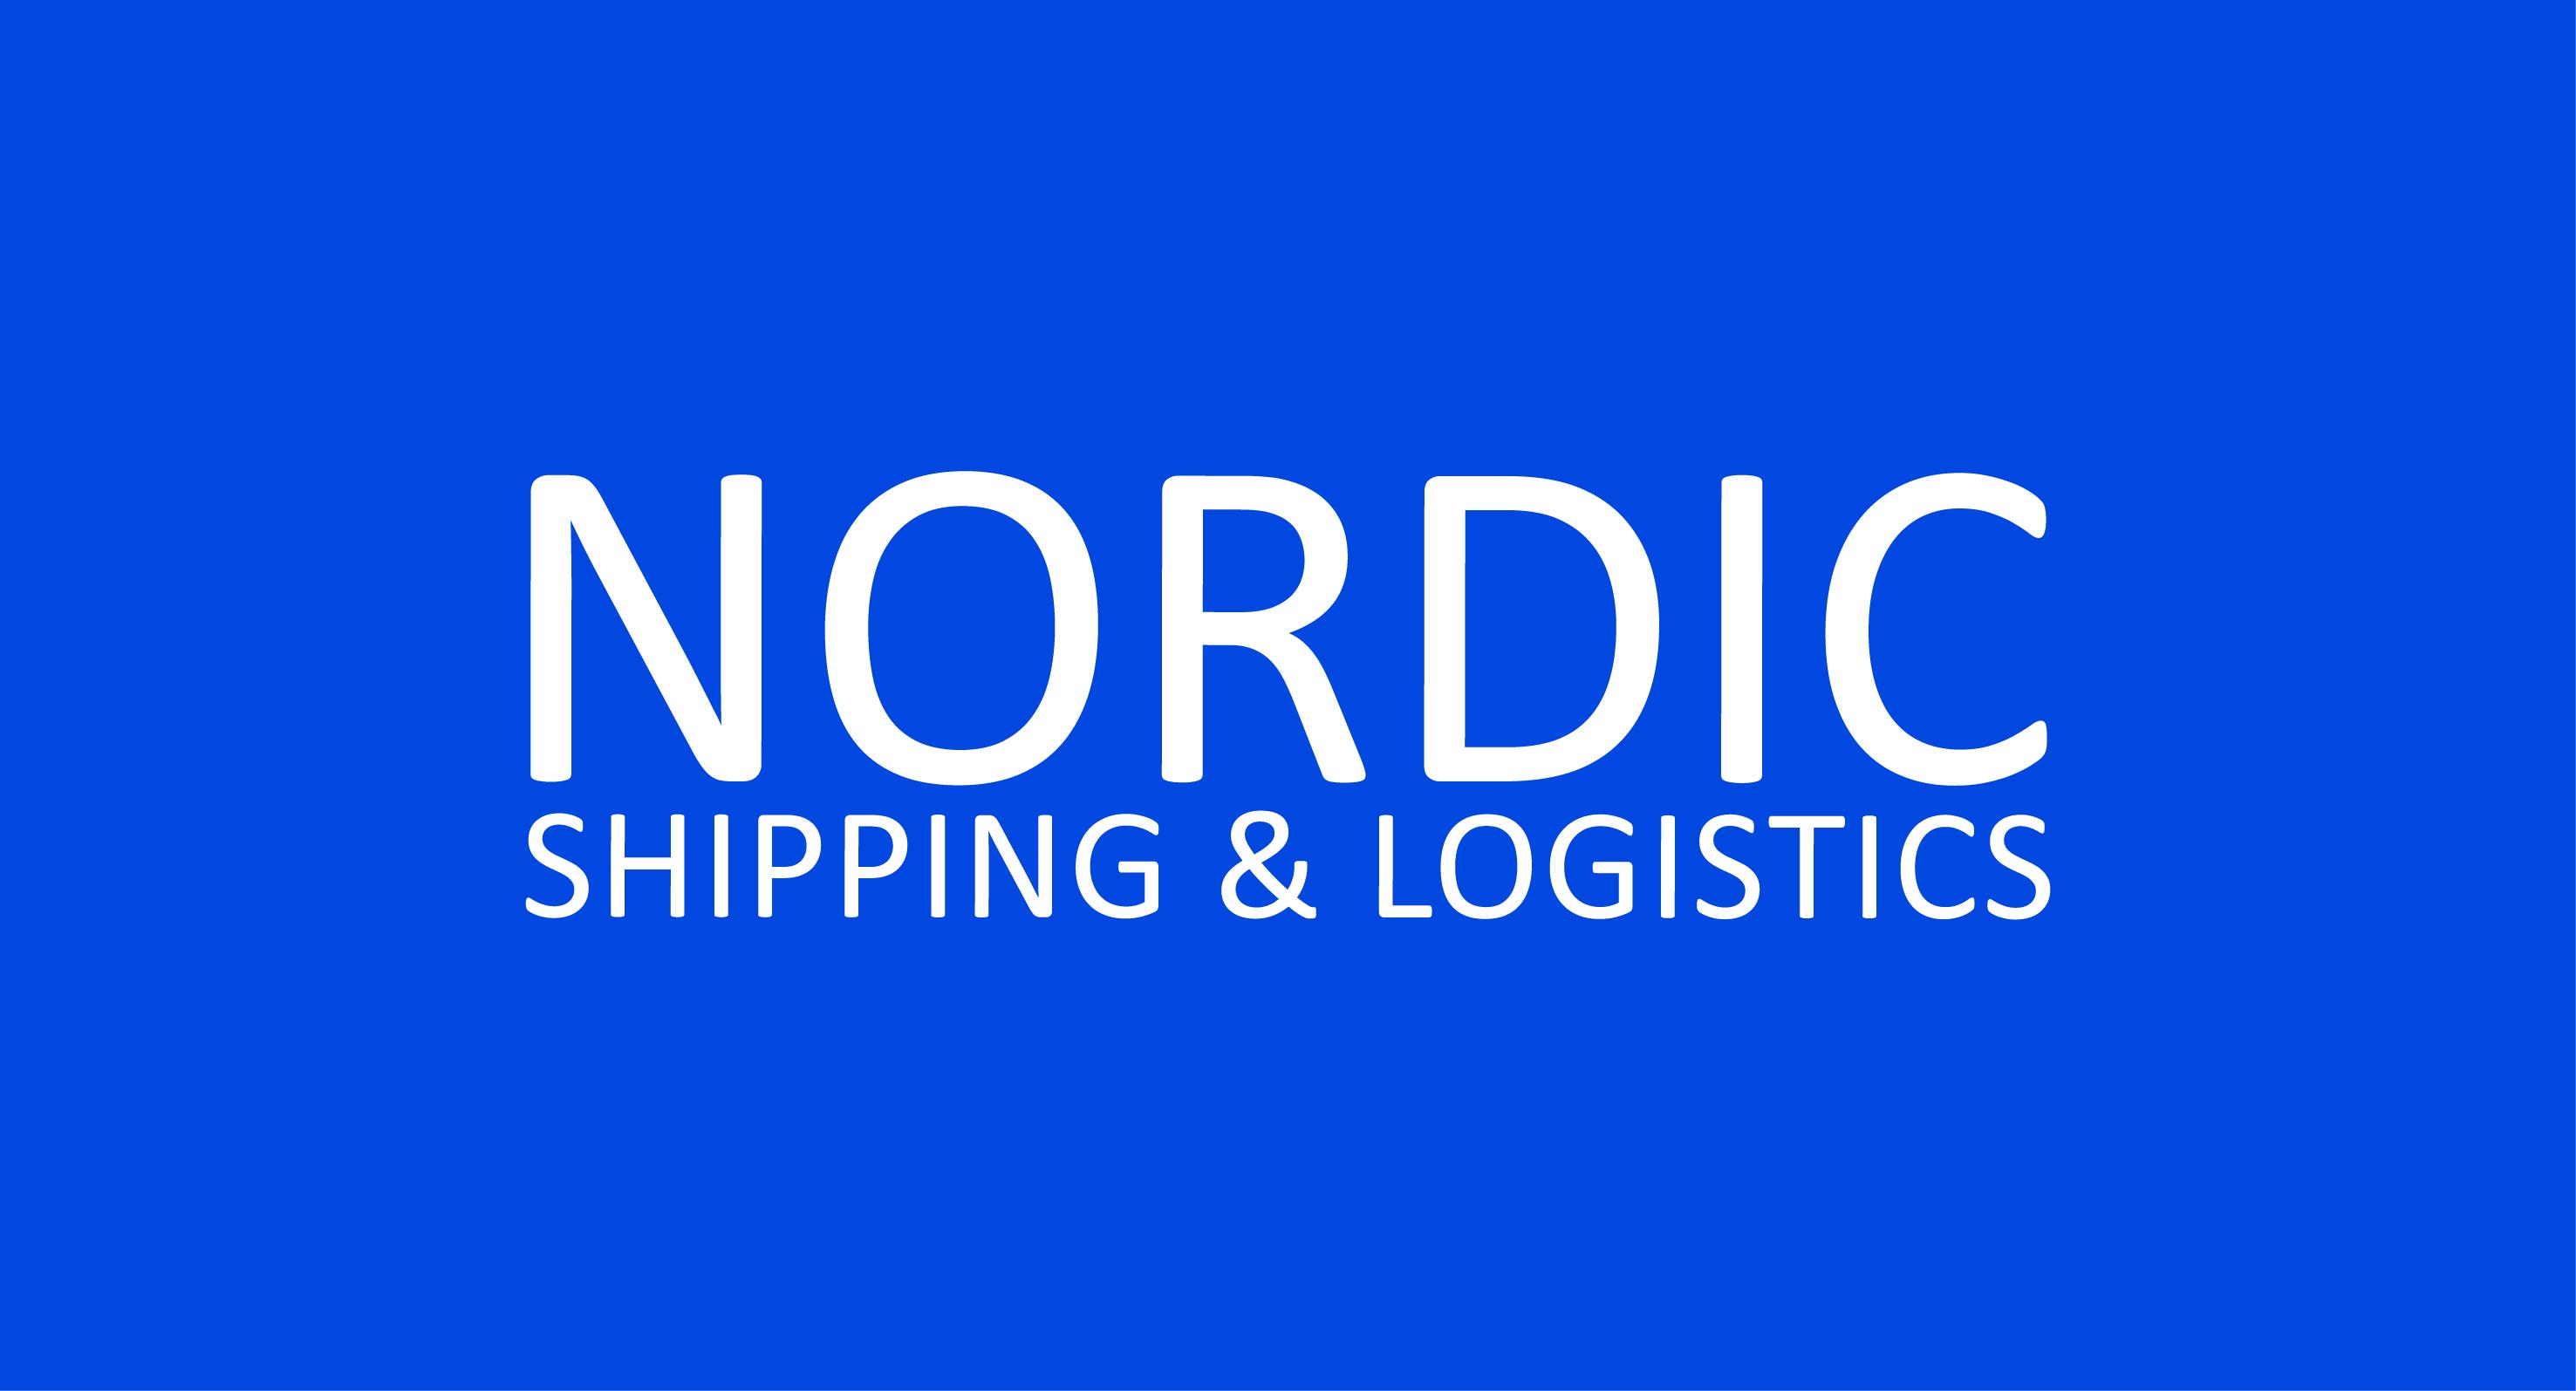 Nordic Shipping & Logistics